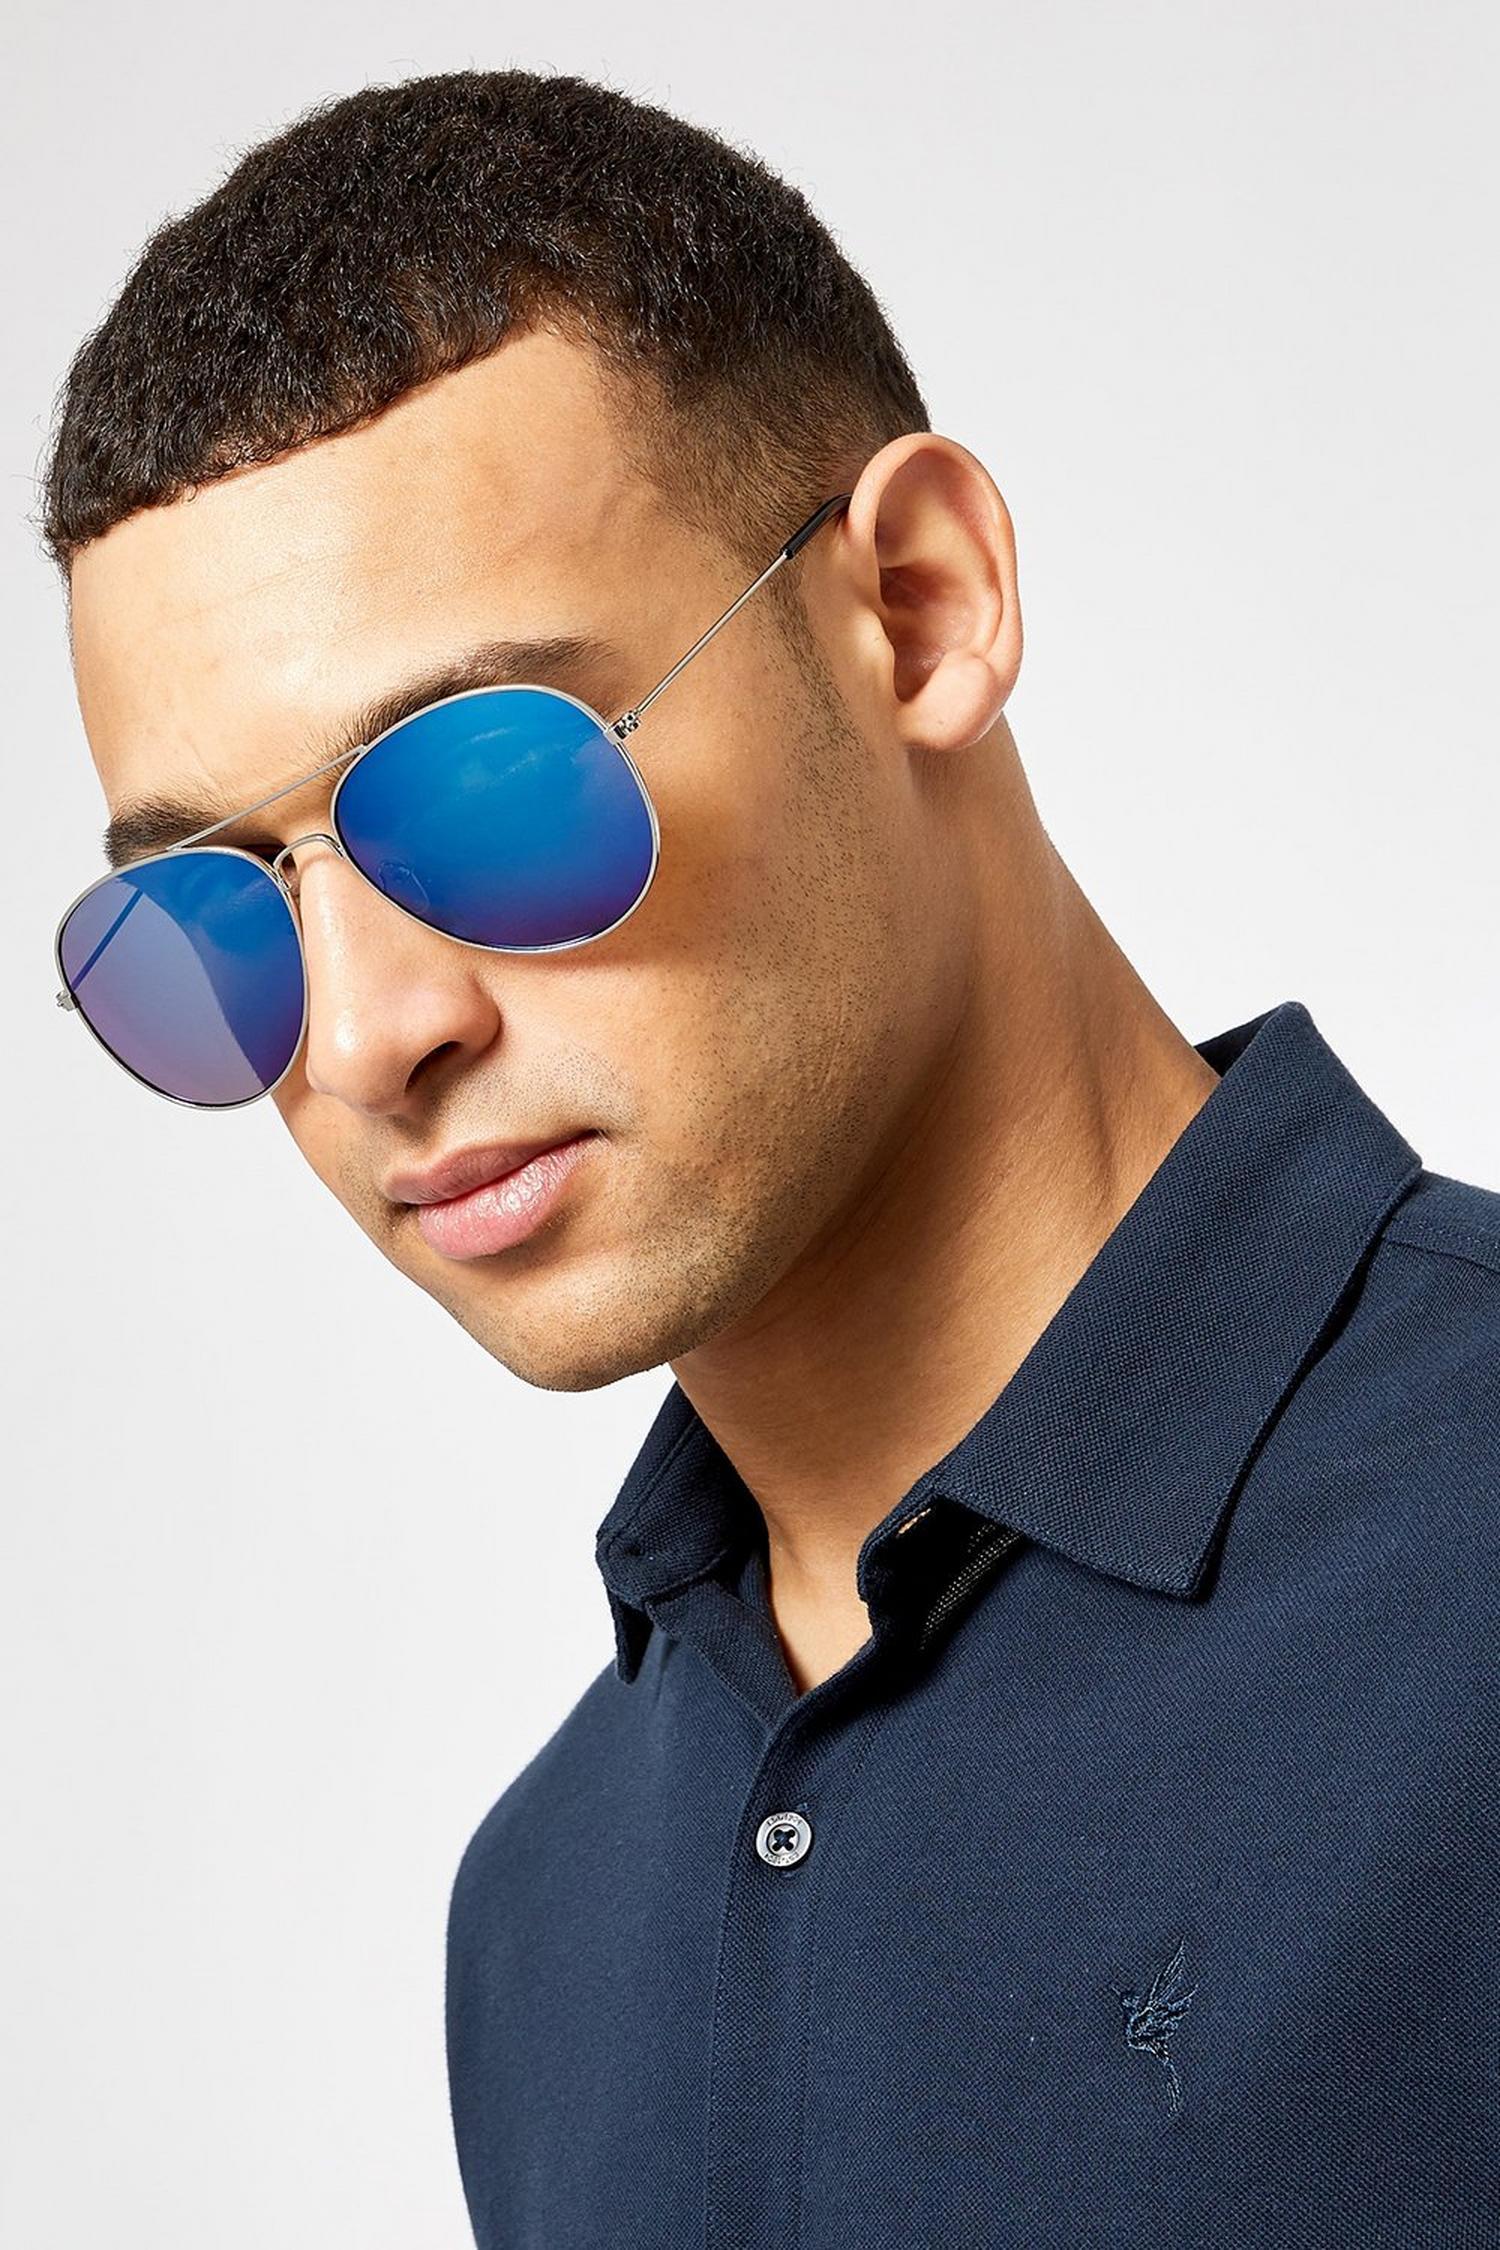 Blue Mirror Sunglasses - £1.80 Delivered (With Code) @ Burton